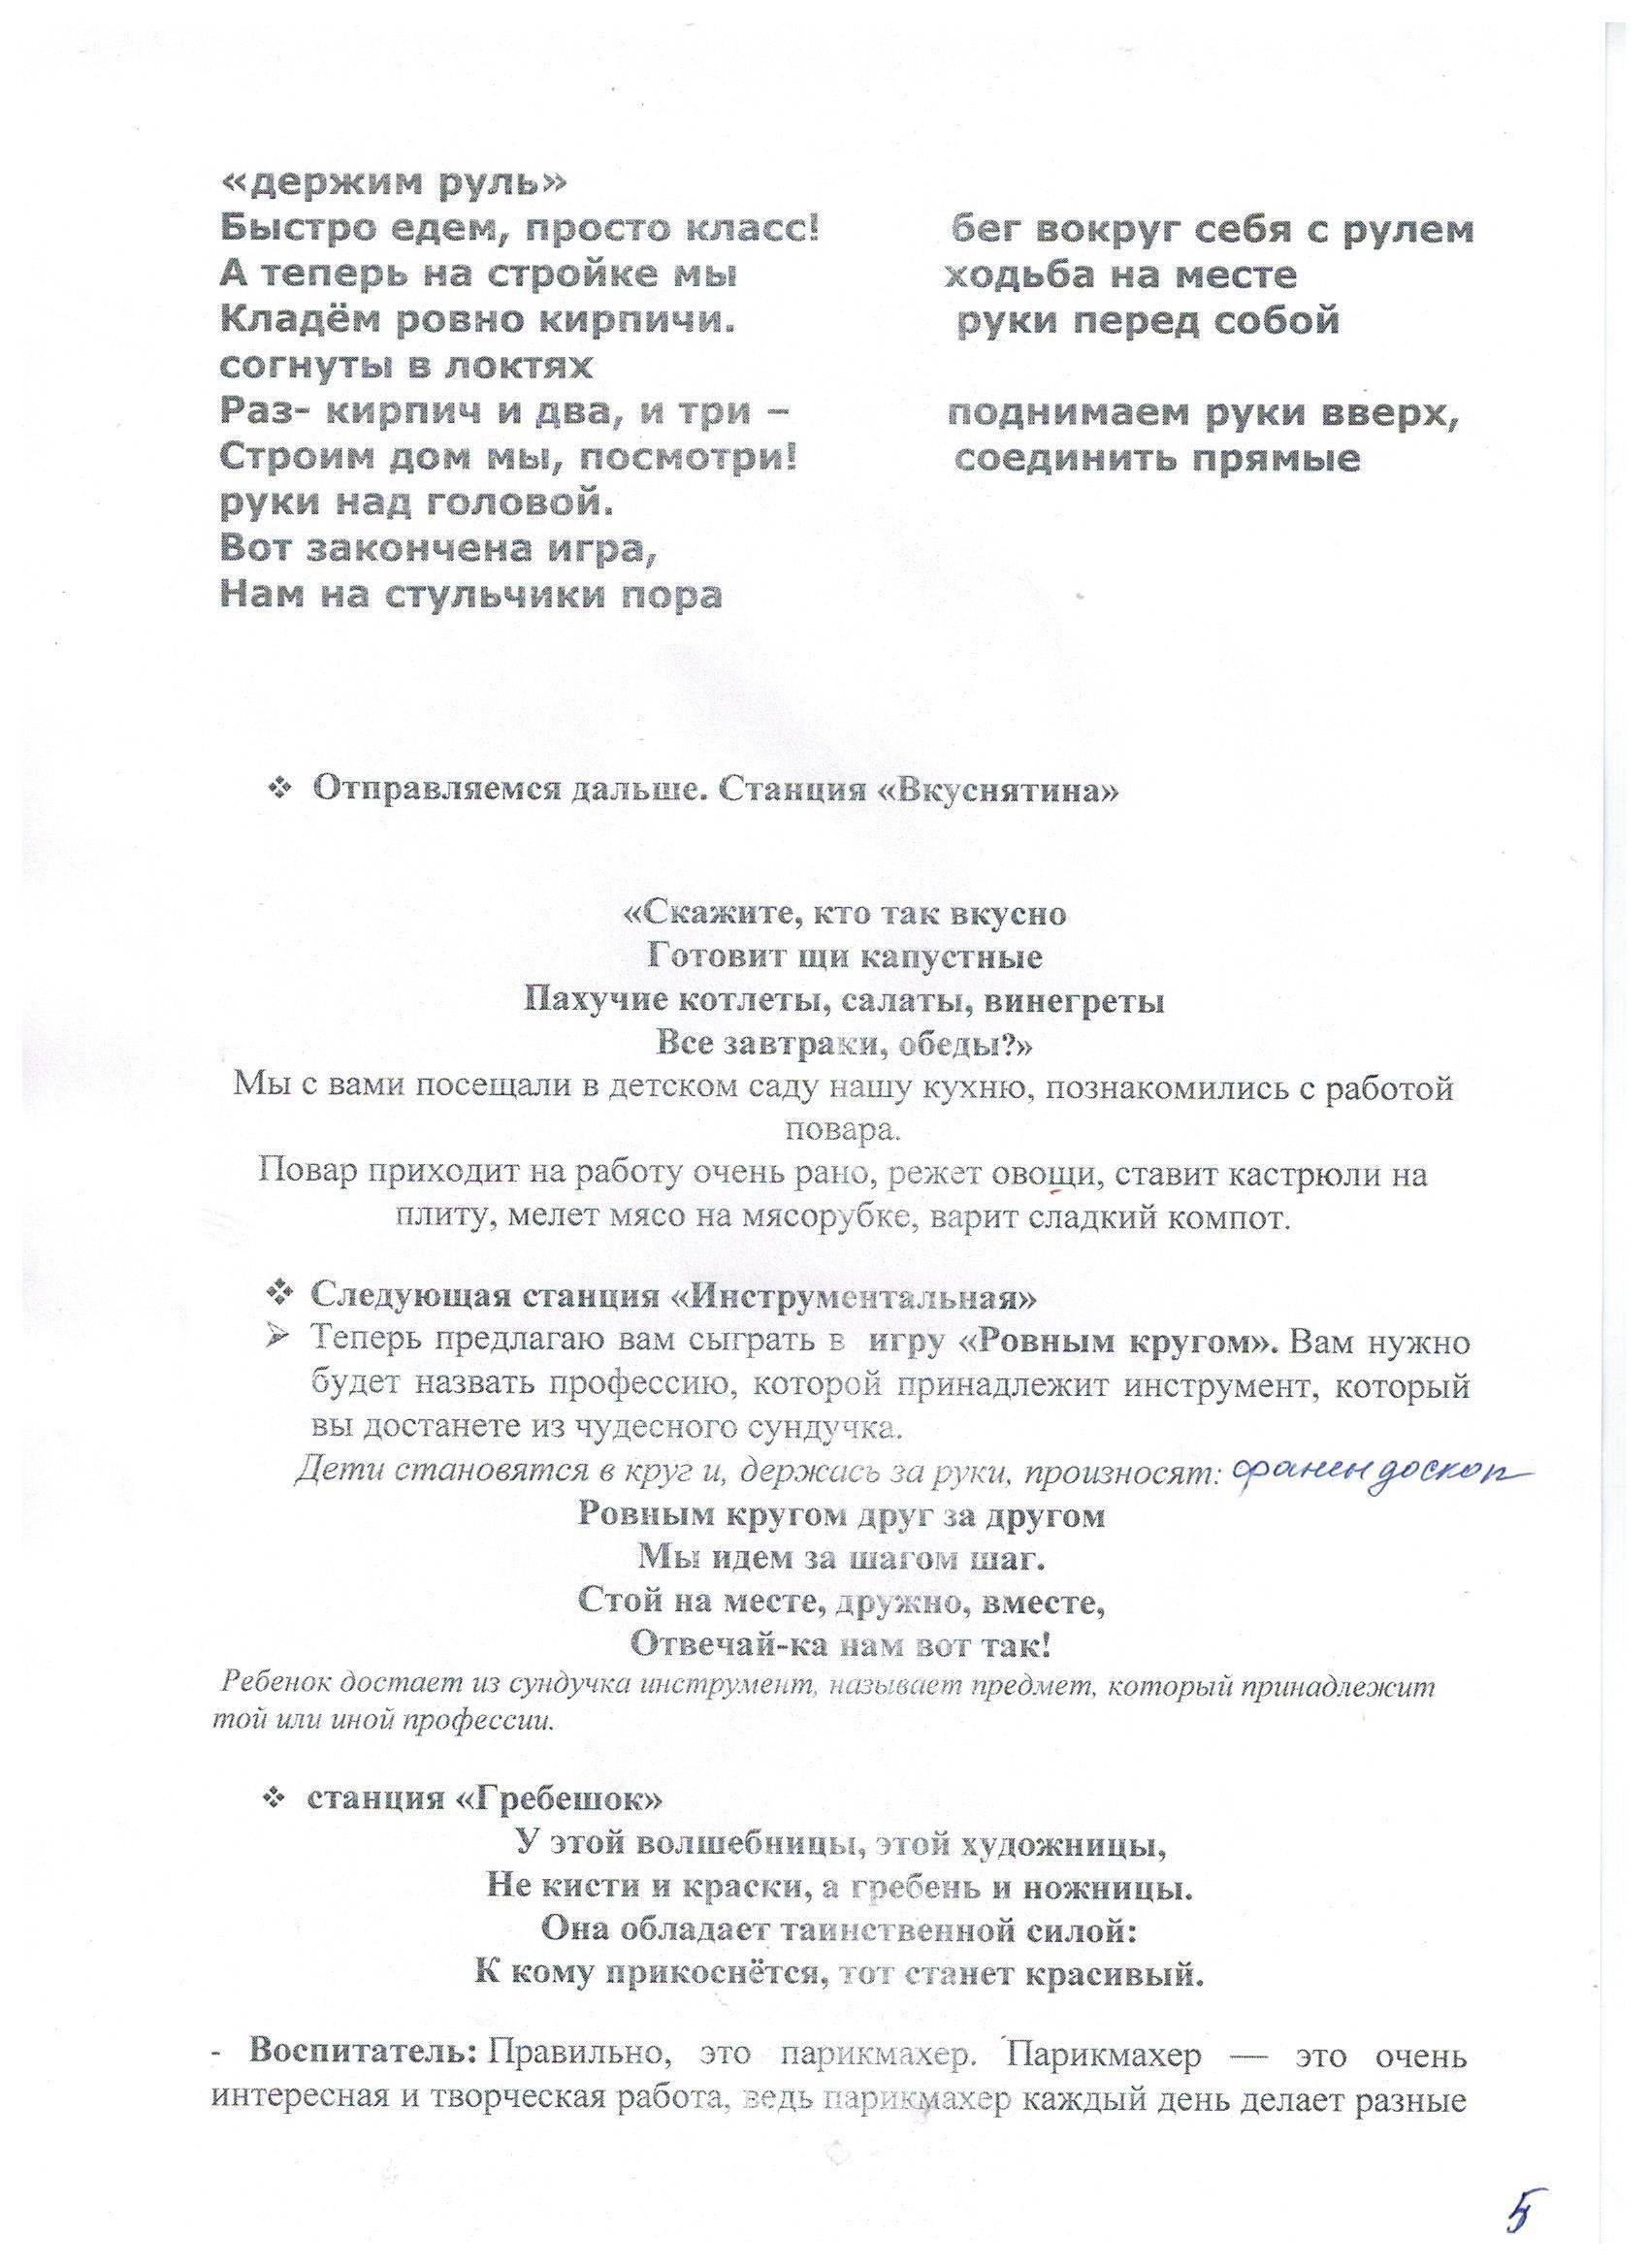 hello_html_mb31f527.jpg